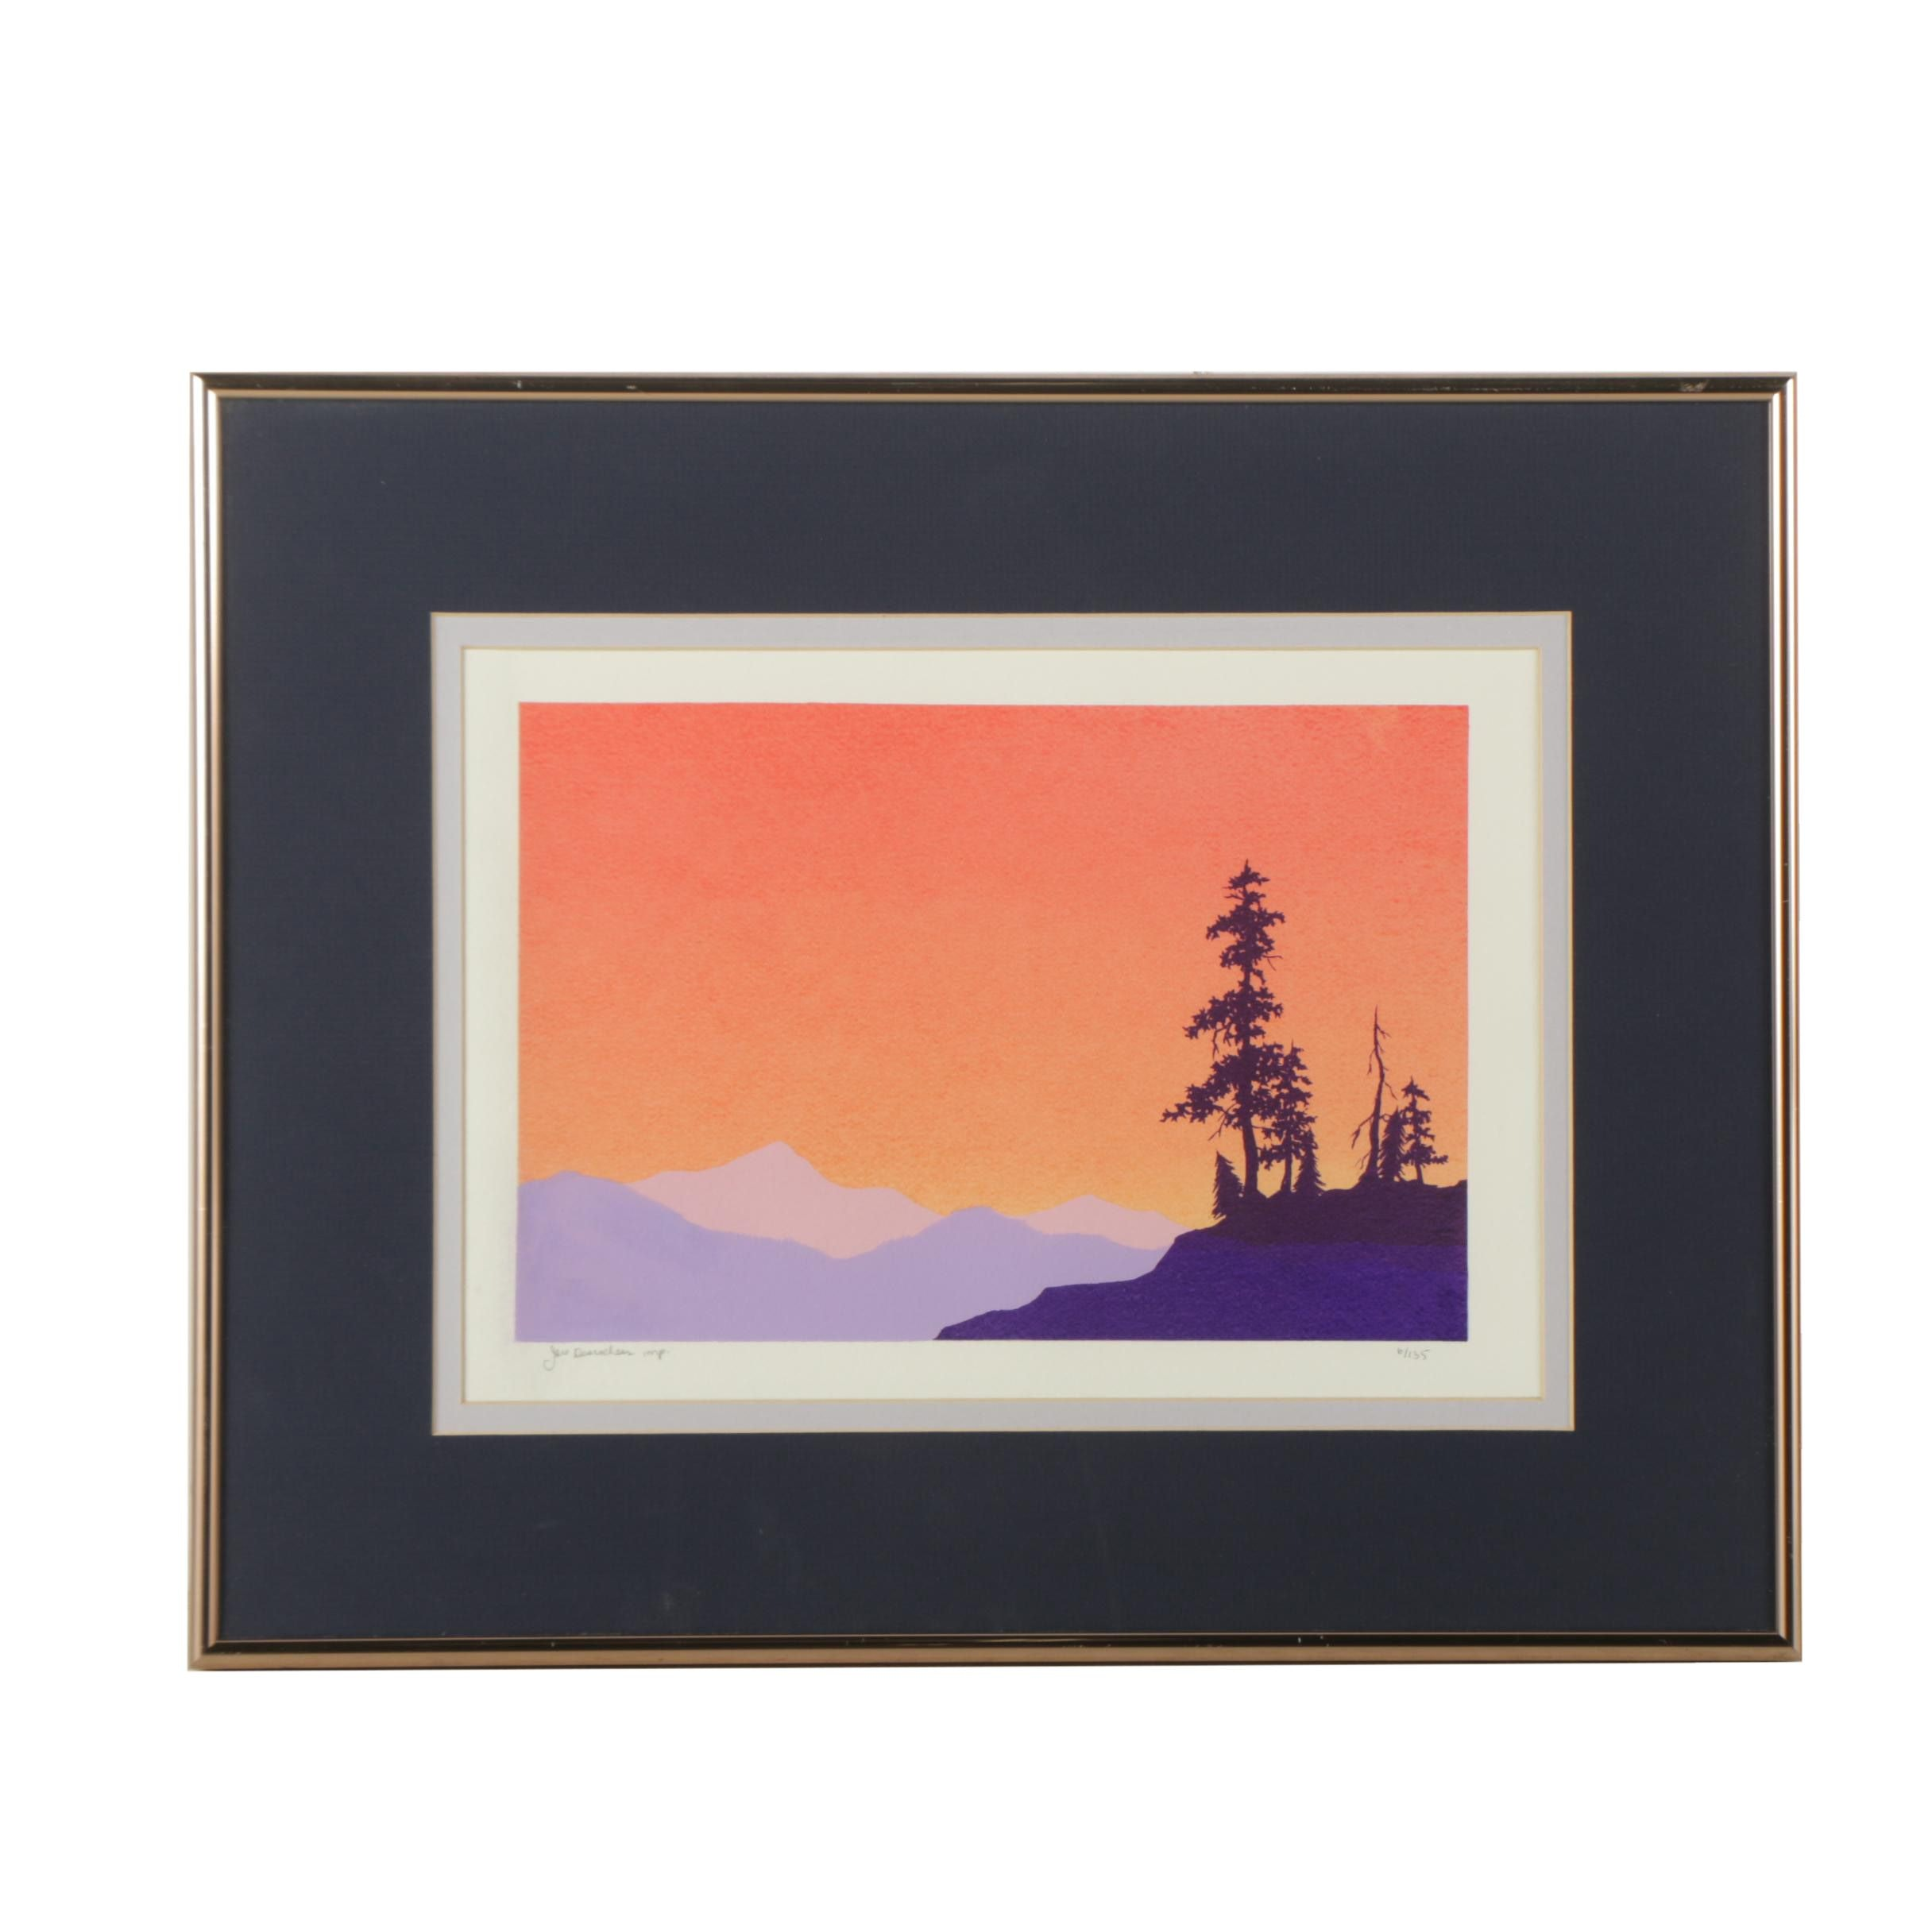 Jeri Desrochers Limited Edition Serigraph Mountain Landscape